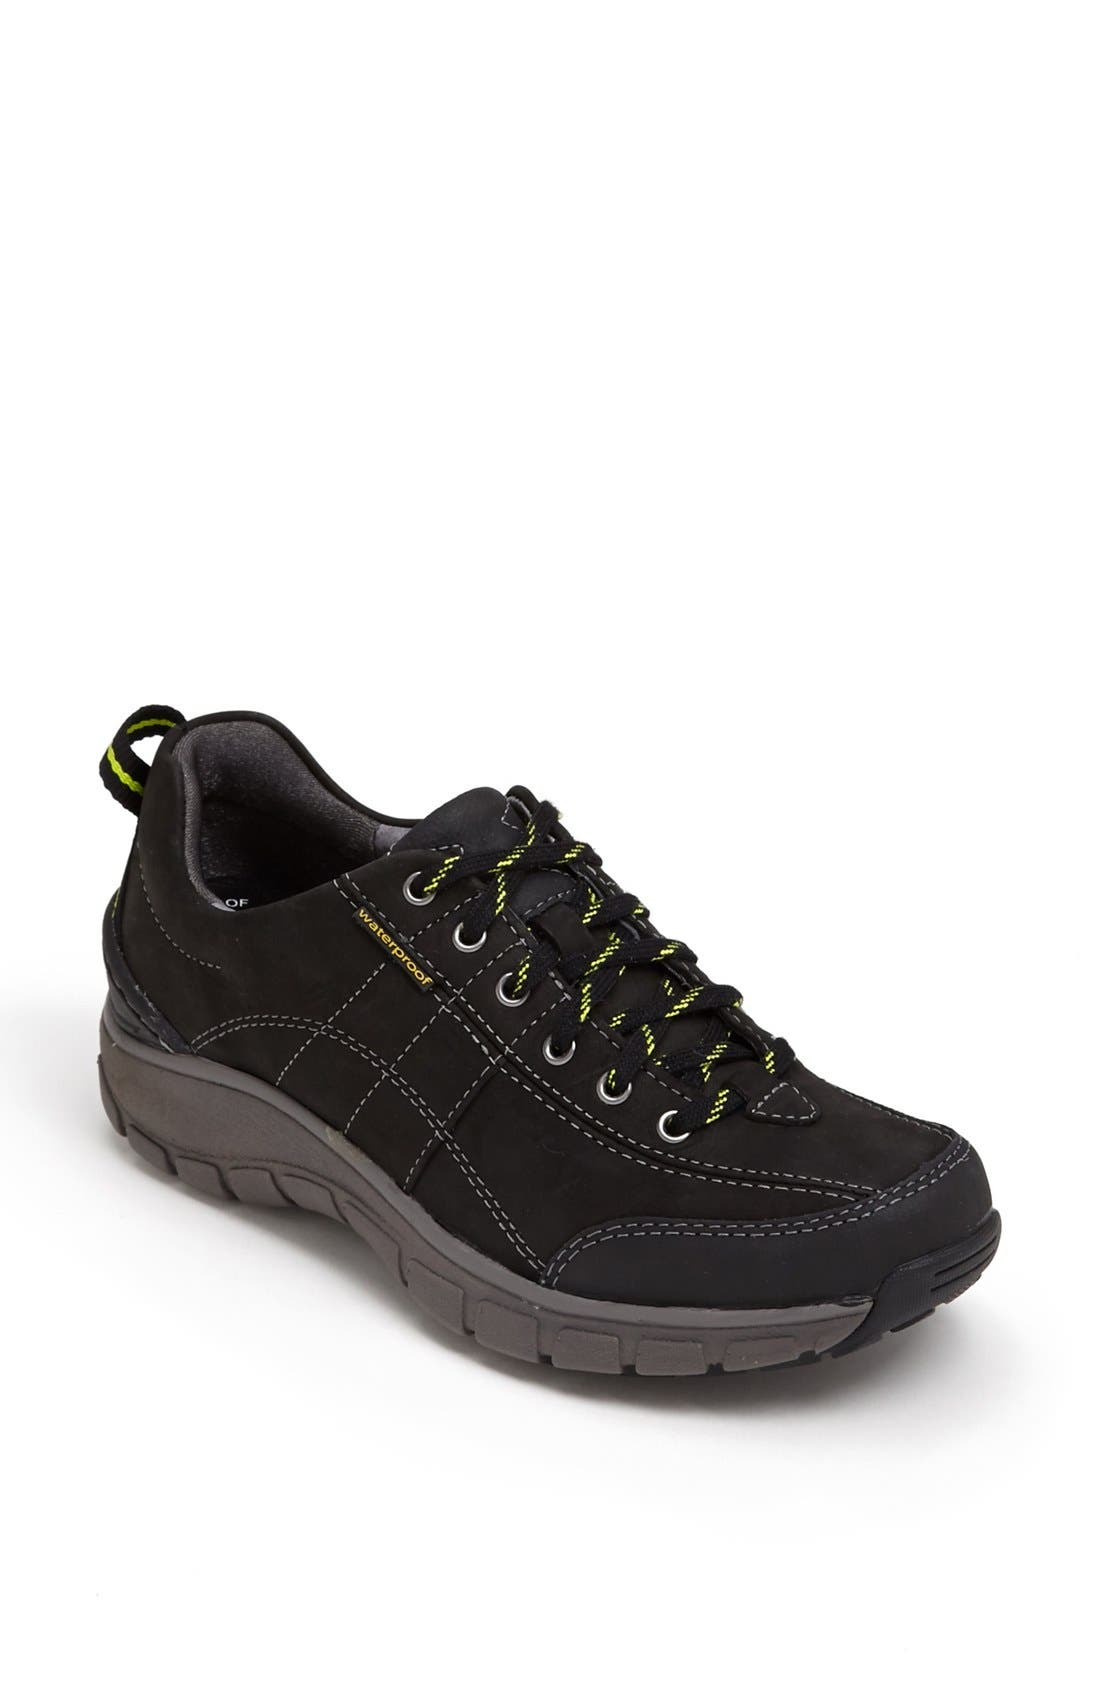 'Wave Trek' Waterproof Sneaker,                             Main thumbnail 1, color,                             BLACK